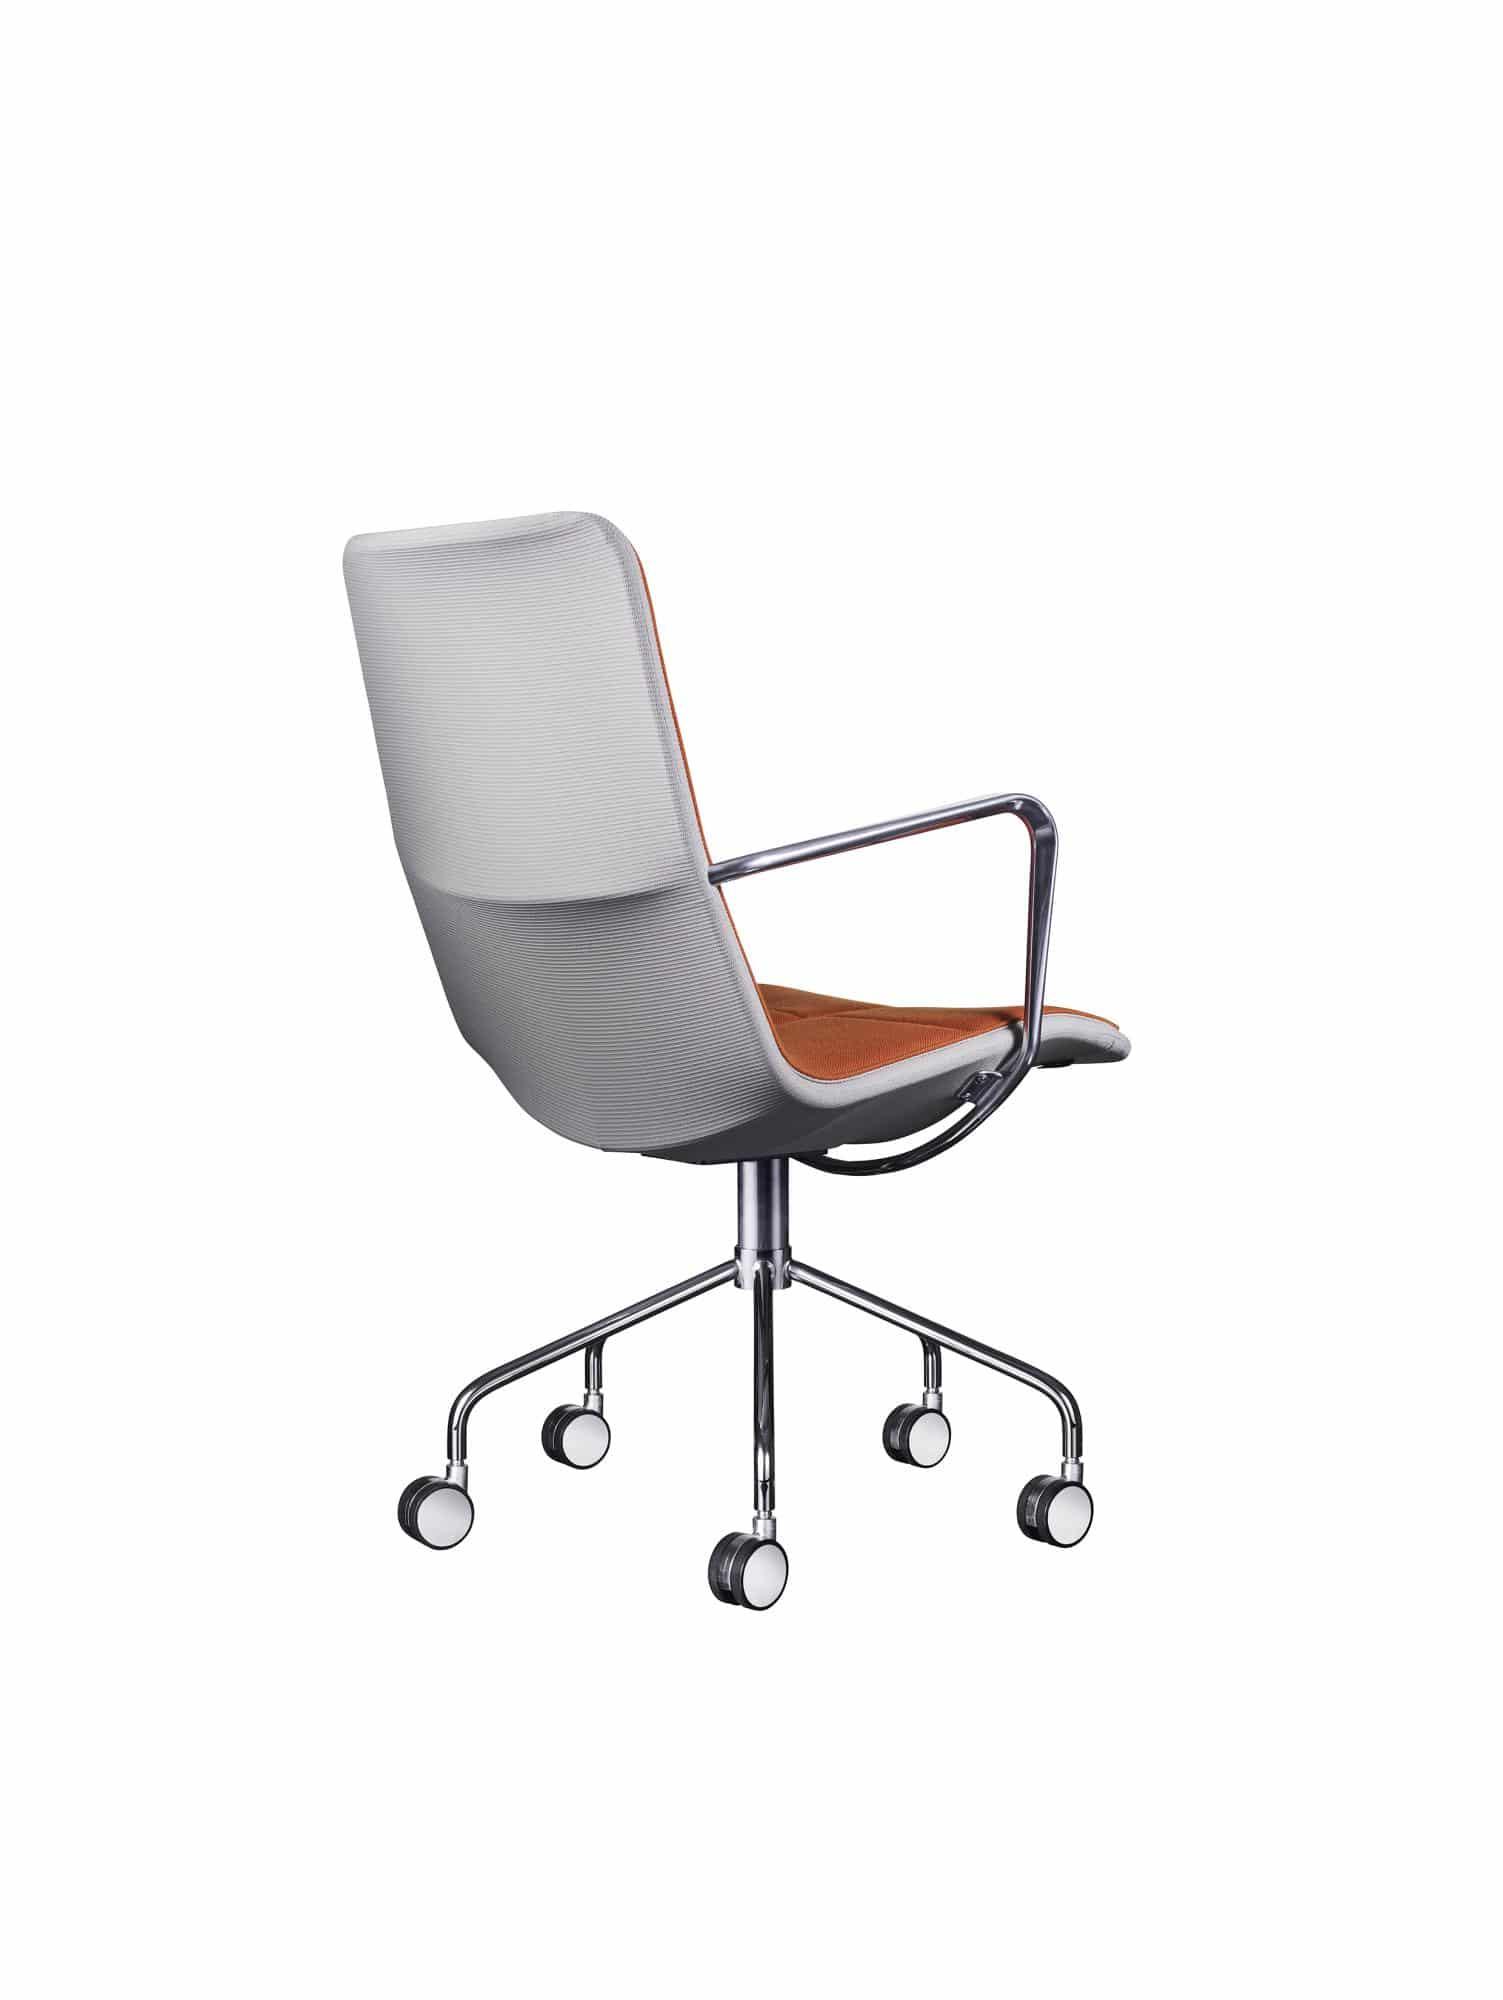 Kite conference chair u2013 Swedese Scandinavian Design